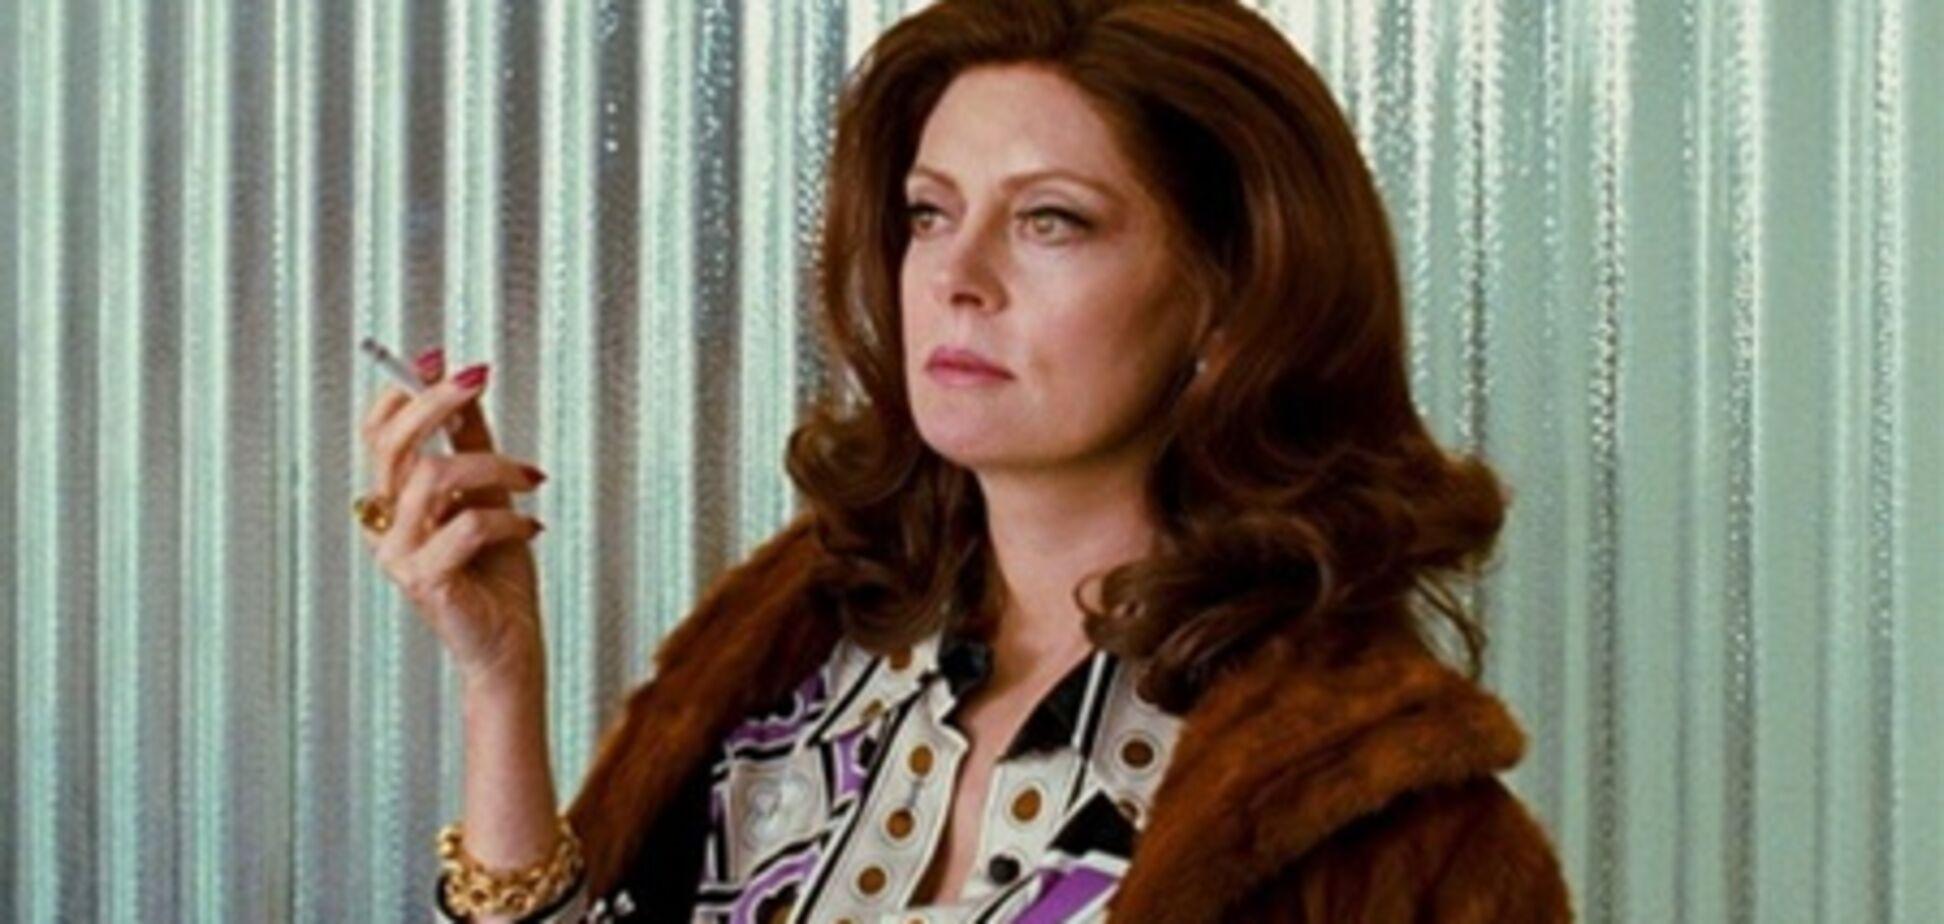 Сьюзен Сарандон снимется вместе со «Скалой»?